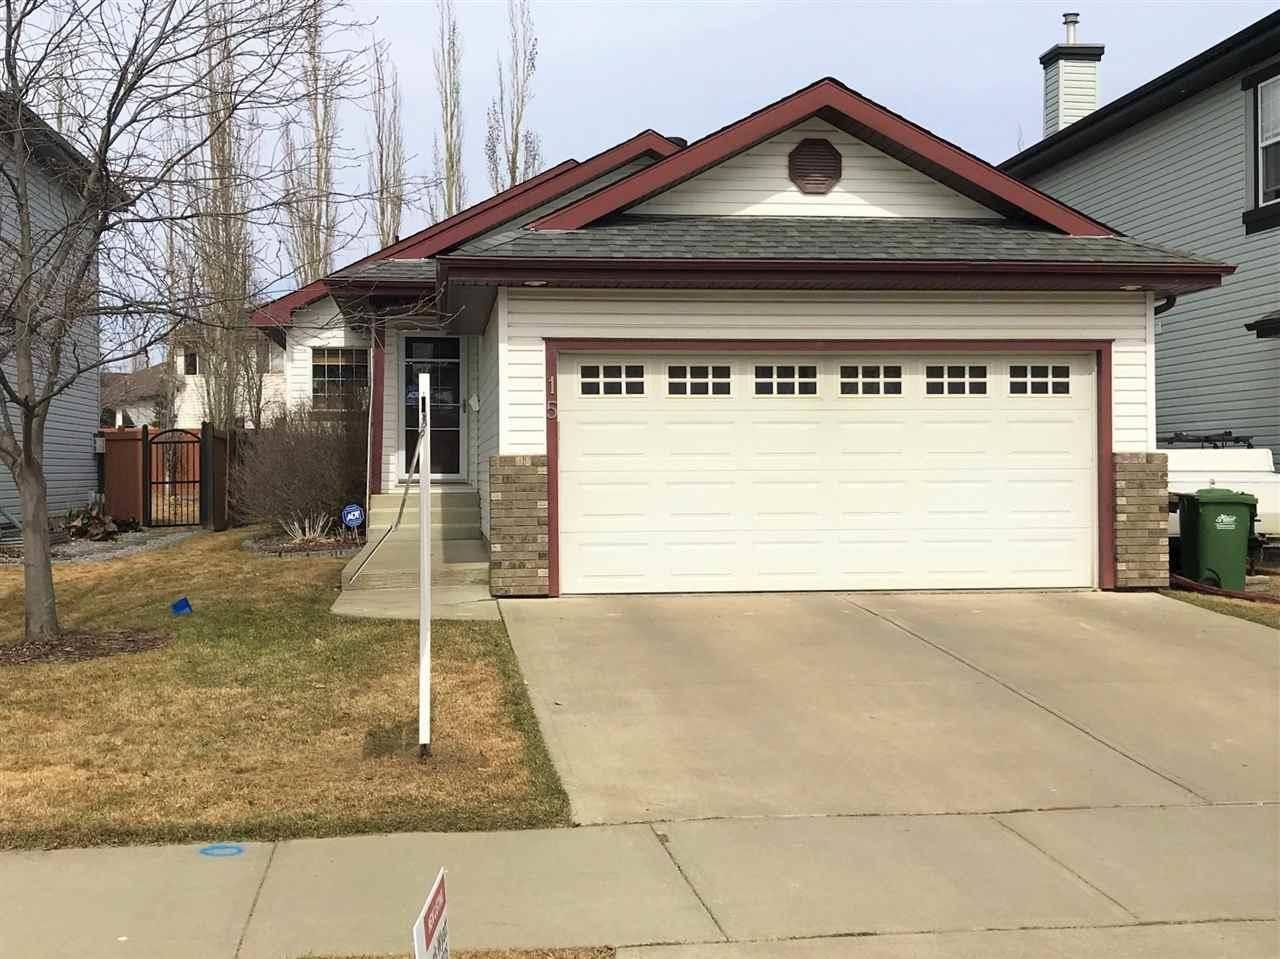 House for sale at 15 Norris Cres St. Albert Alberta - MLS: E4191824